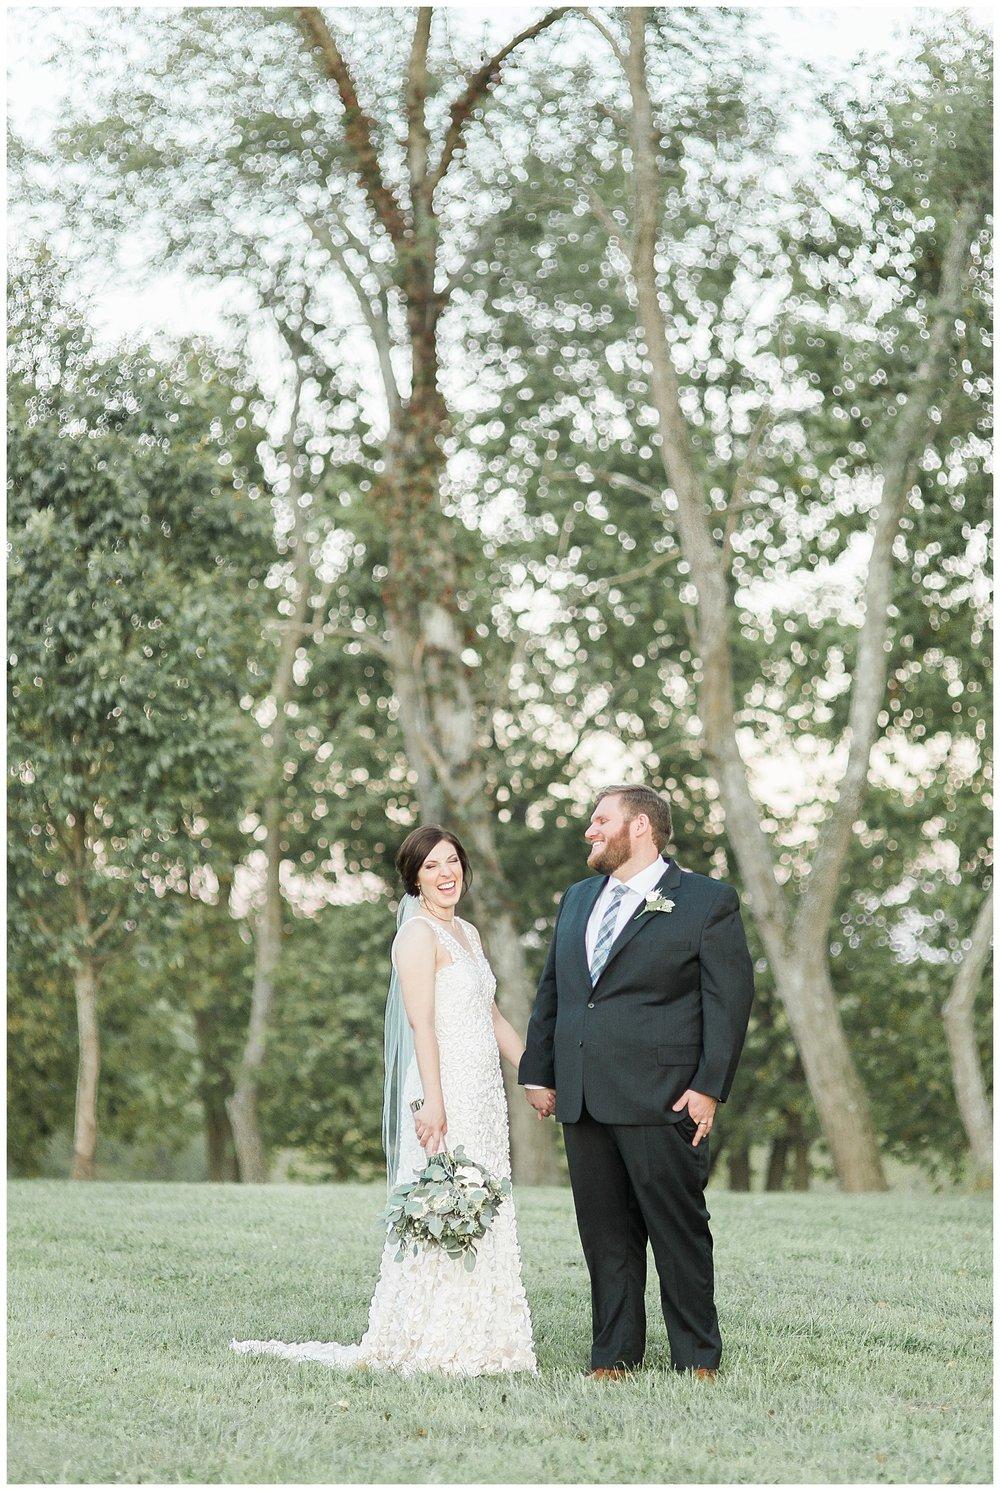 everleigh-photography-pyramid-hill-sculpture-park-cincinnati-wedding-photographer-the-faller-wedding-48